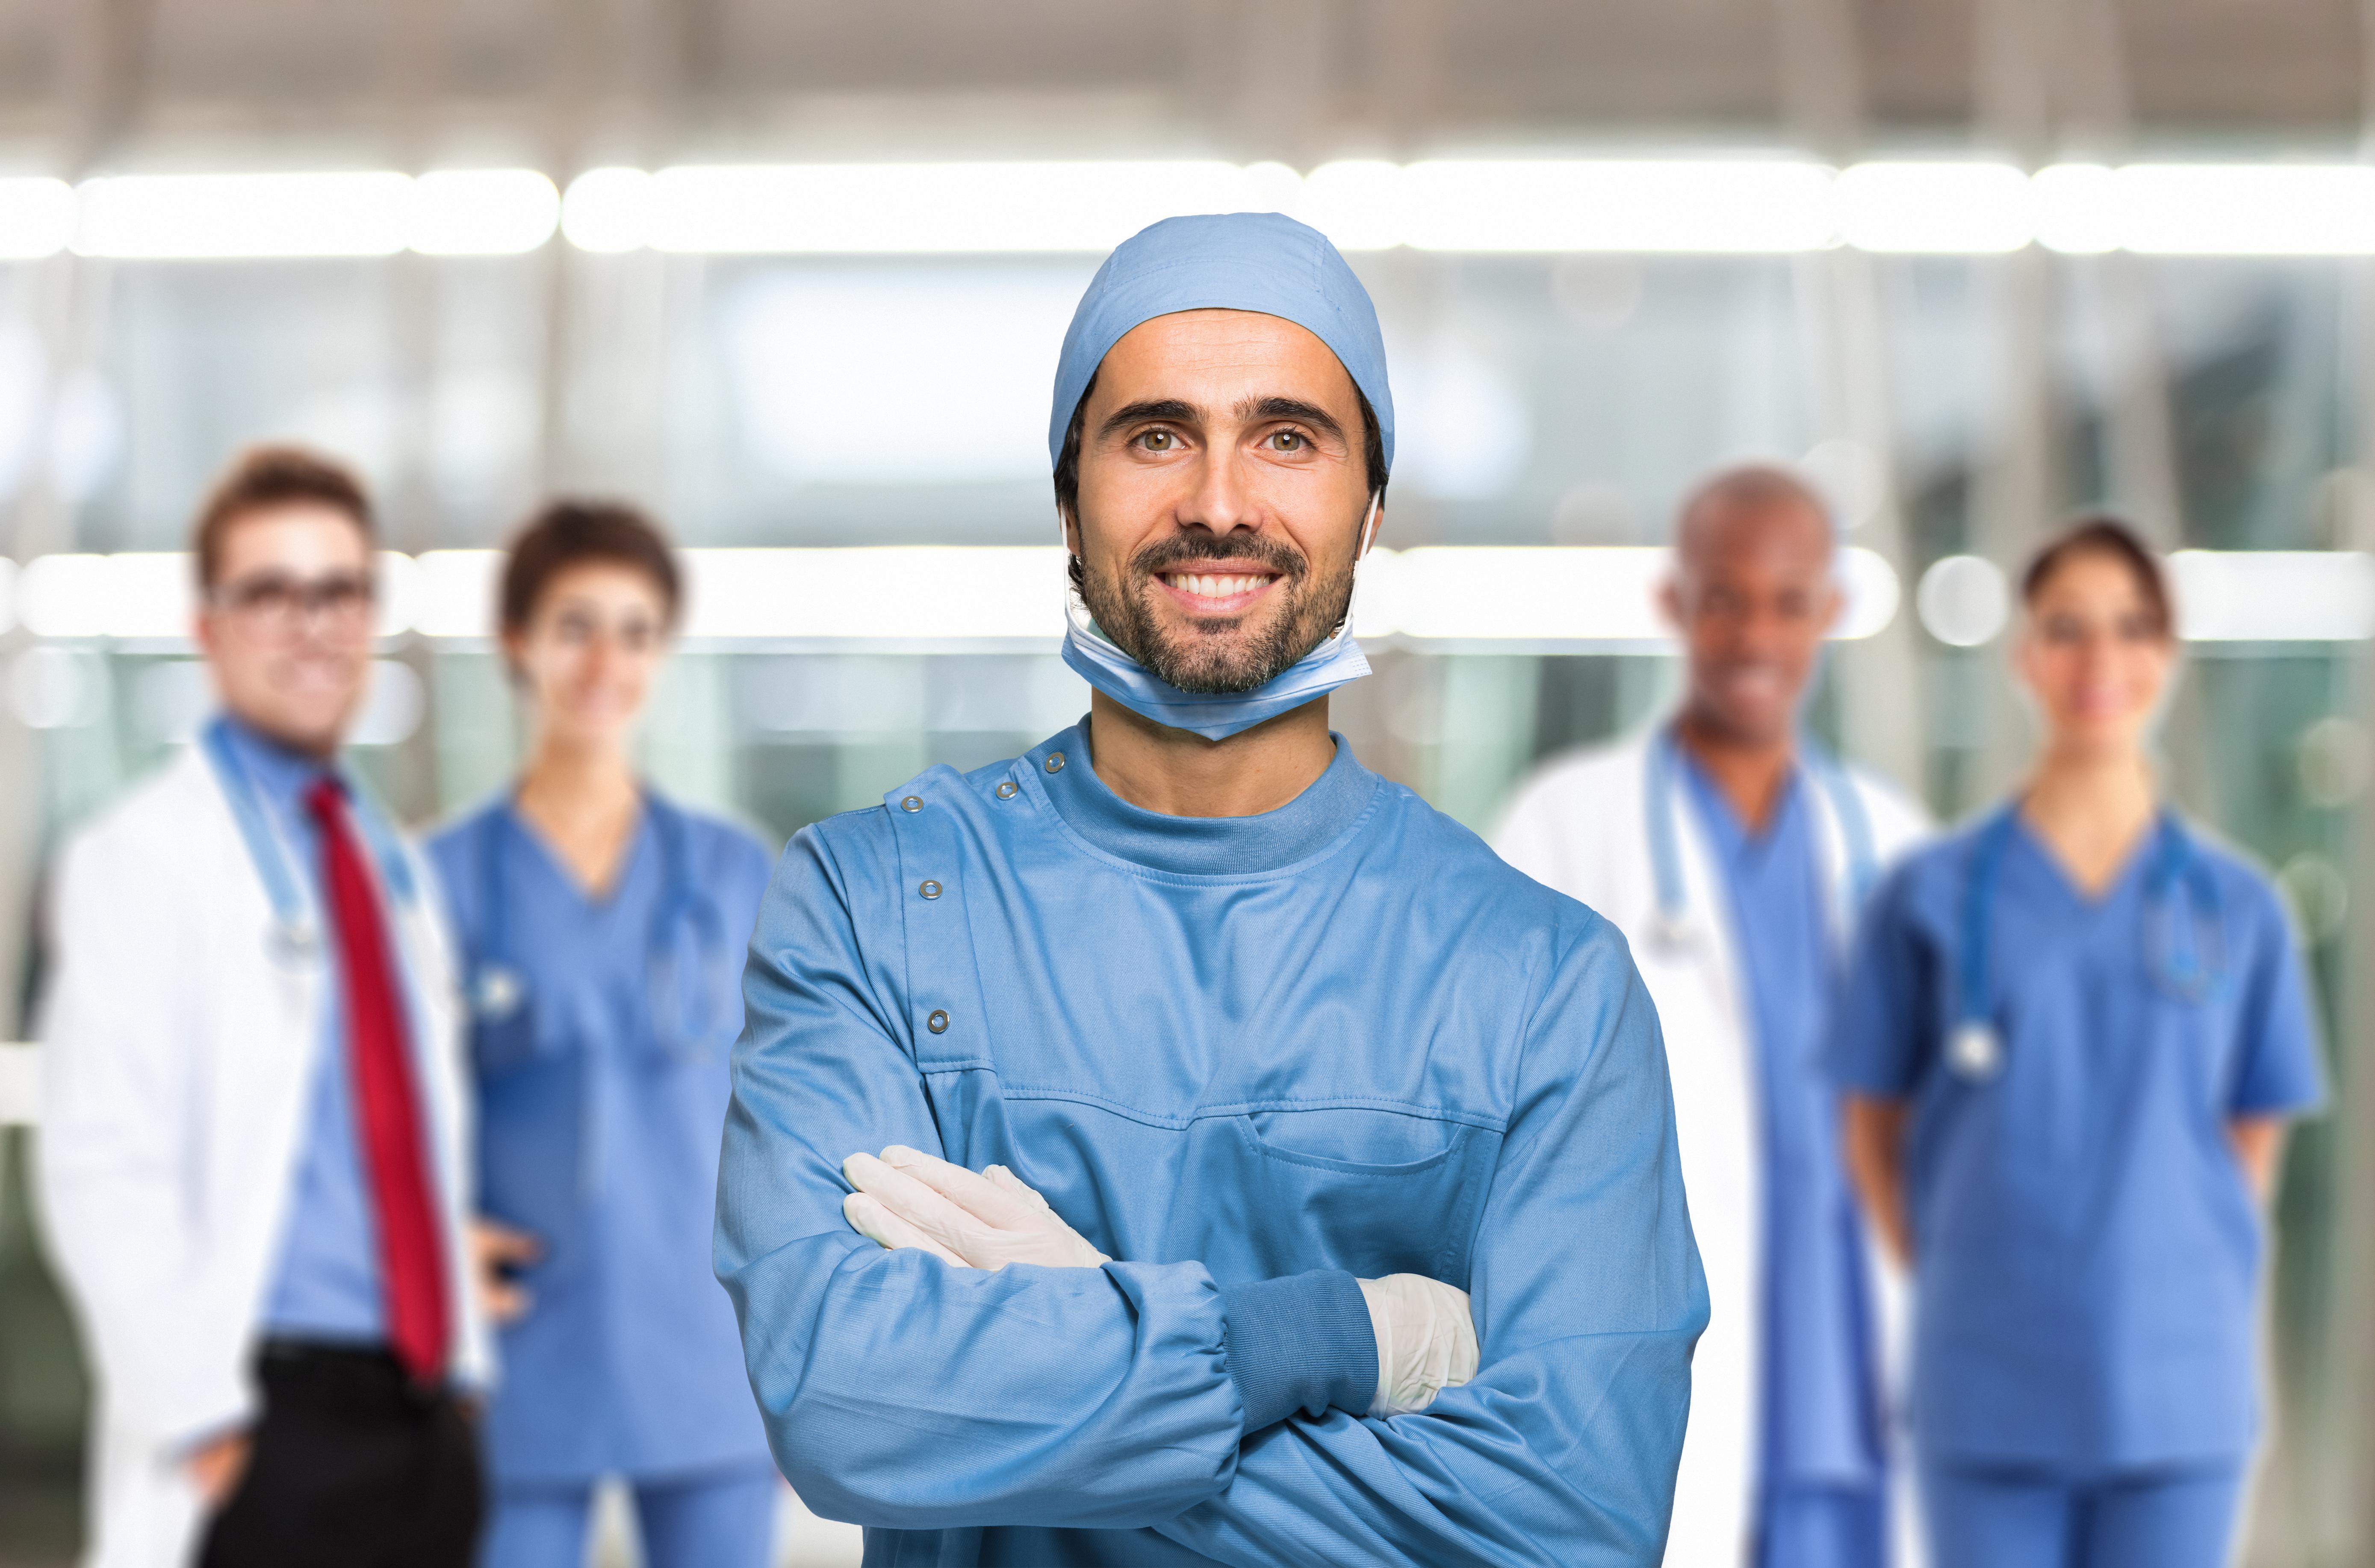 Recruiting Surgeons